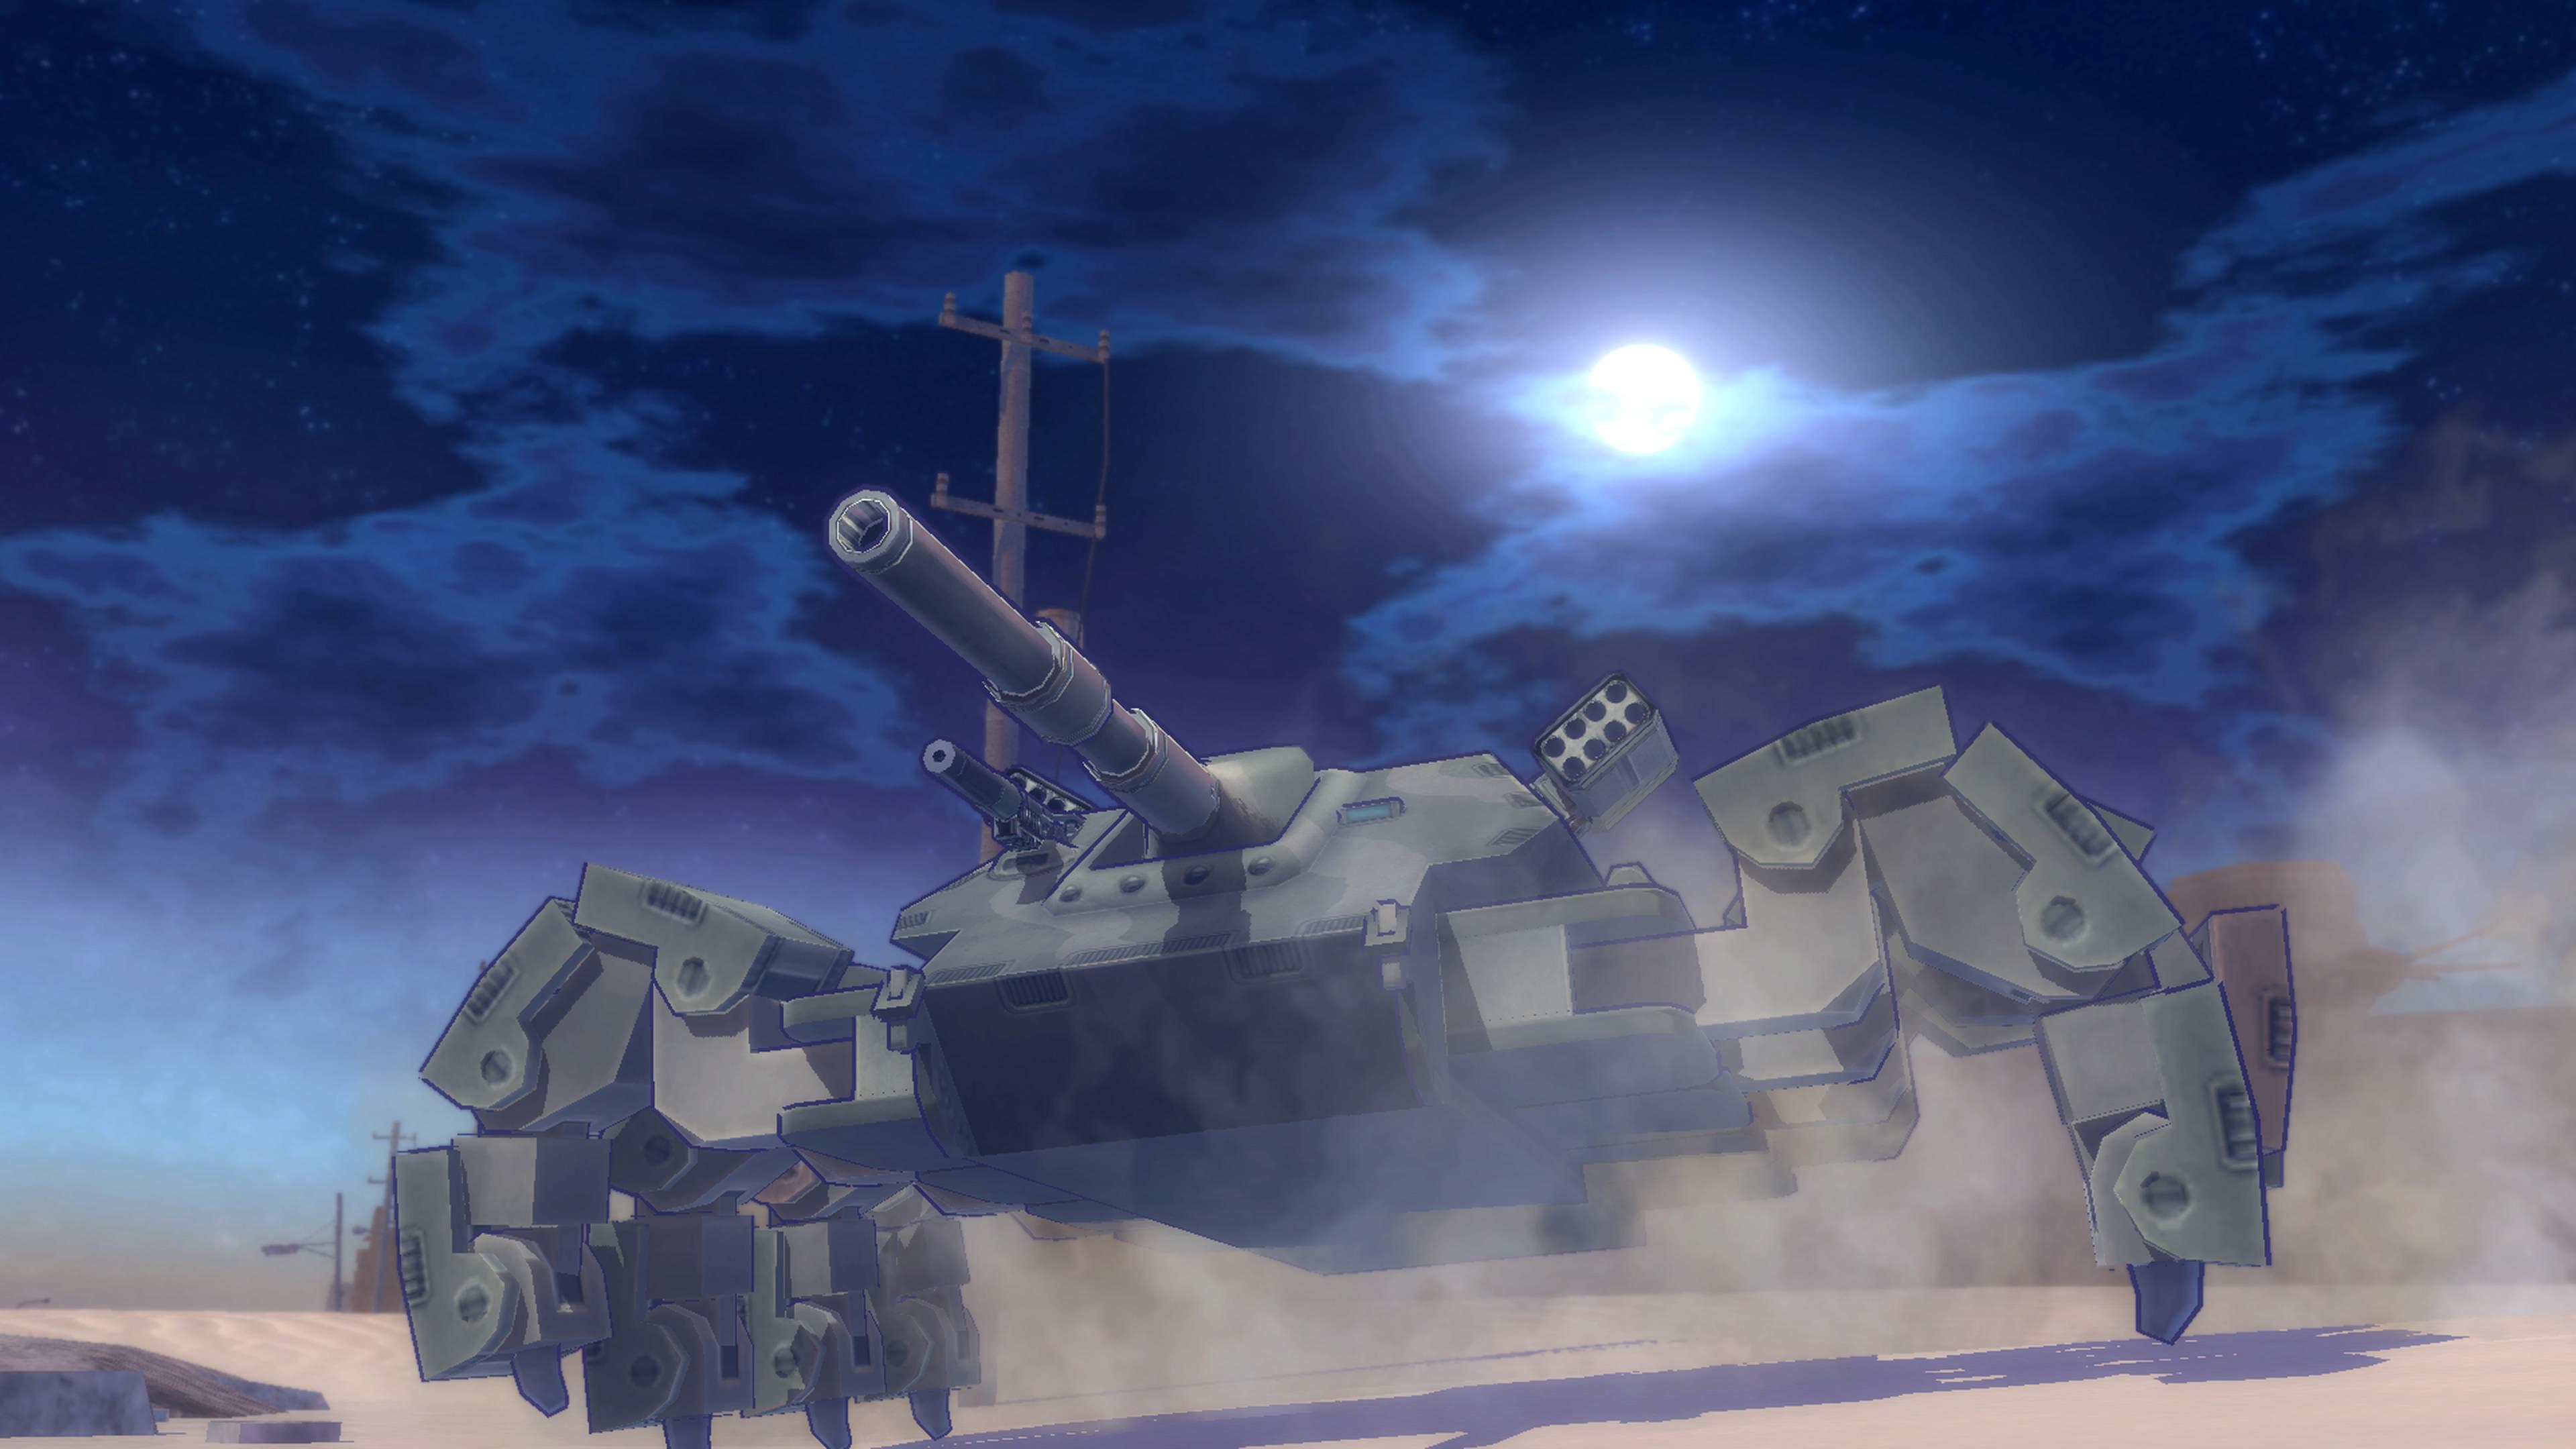 opB8O1bO3siki - 【画像】PS4「メタルマックス 最新作」をご覧ください